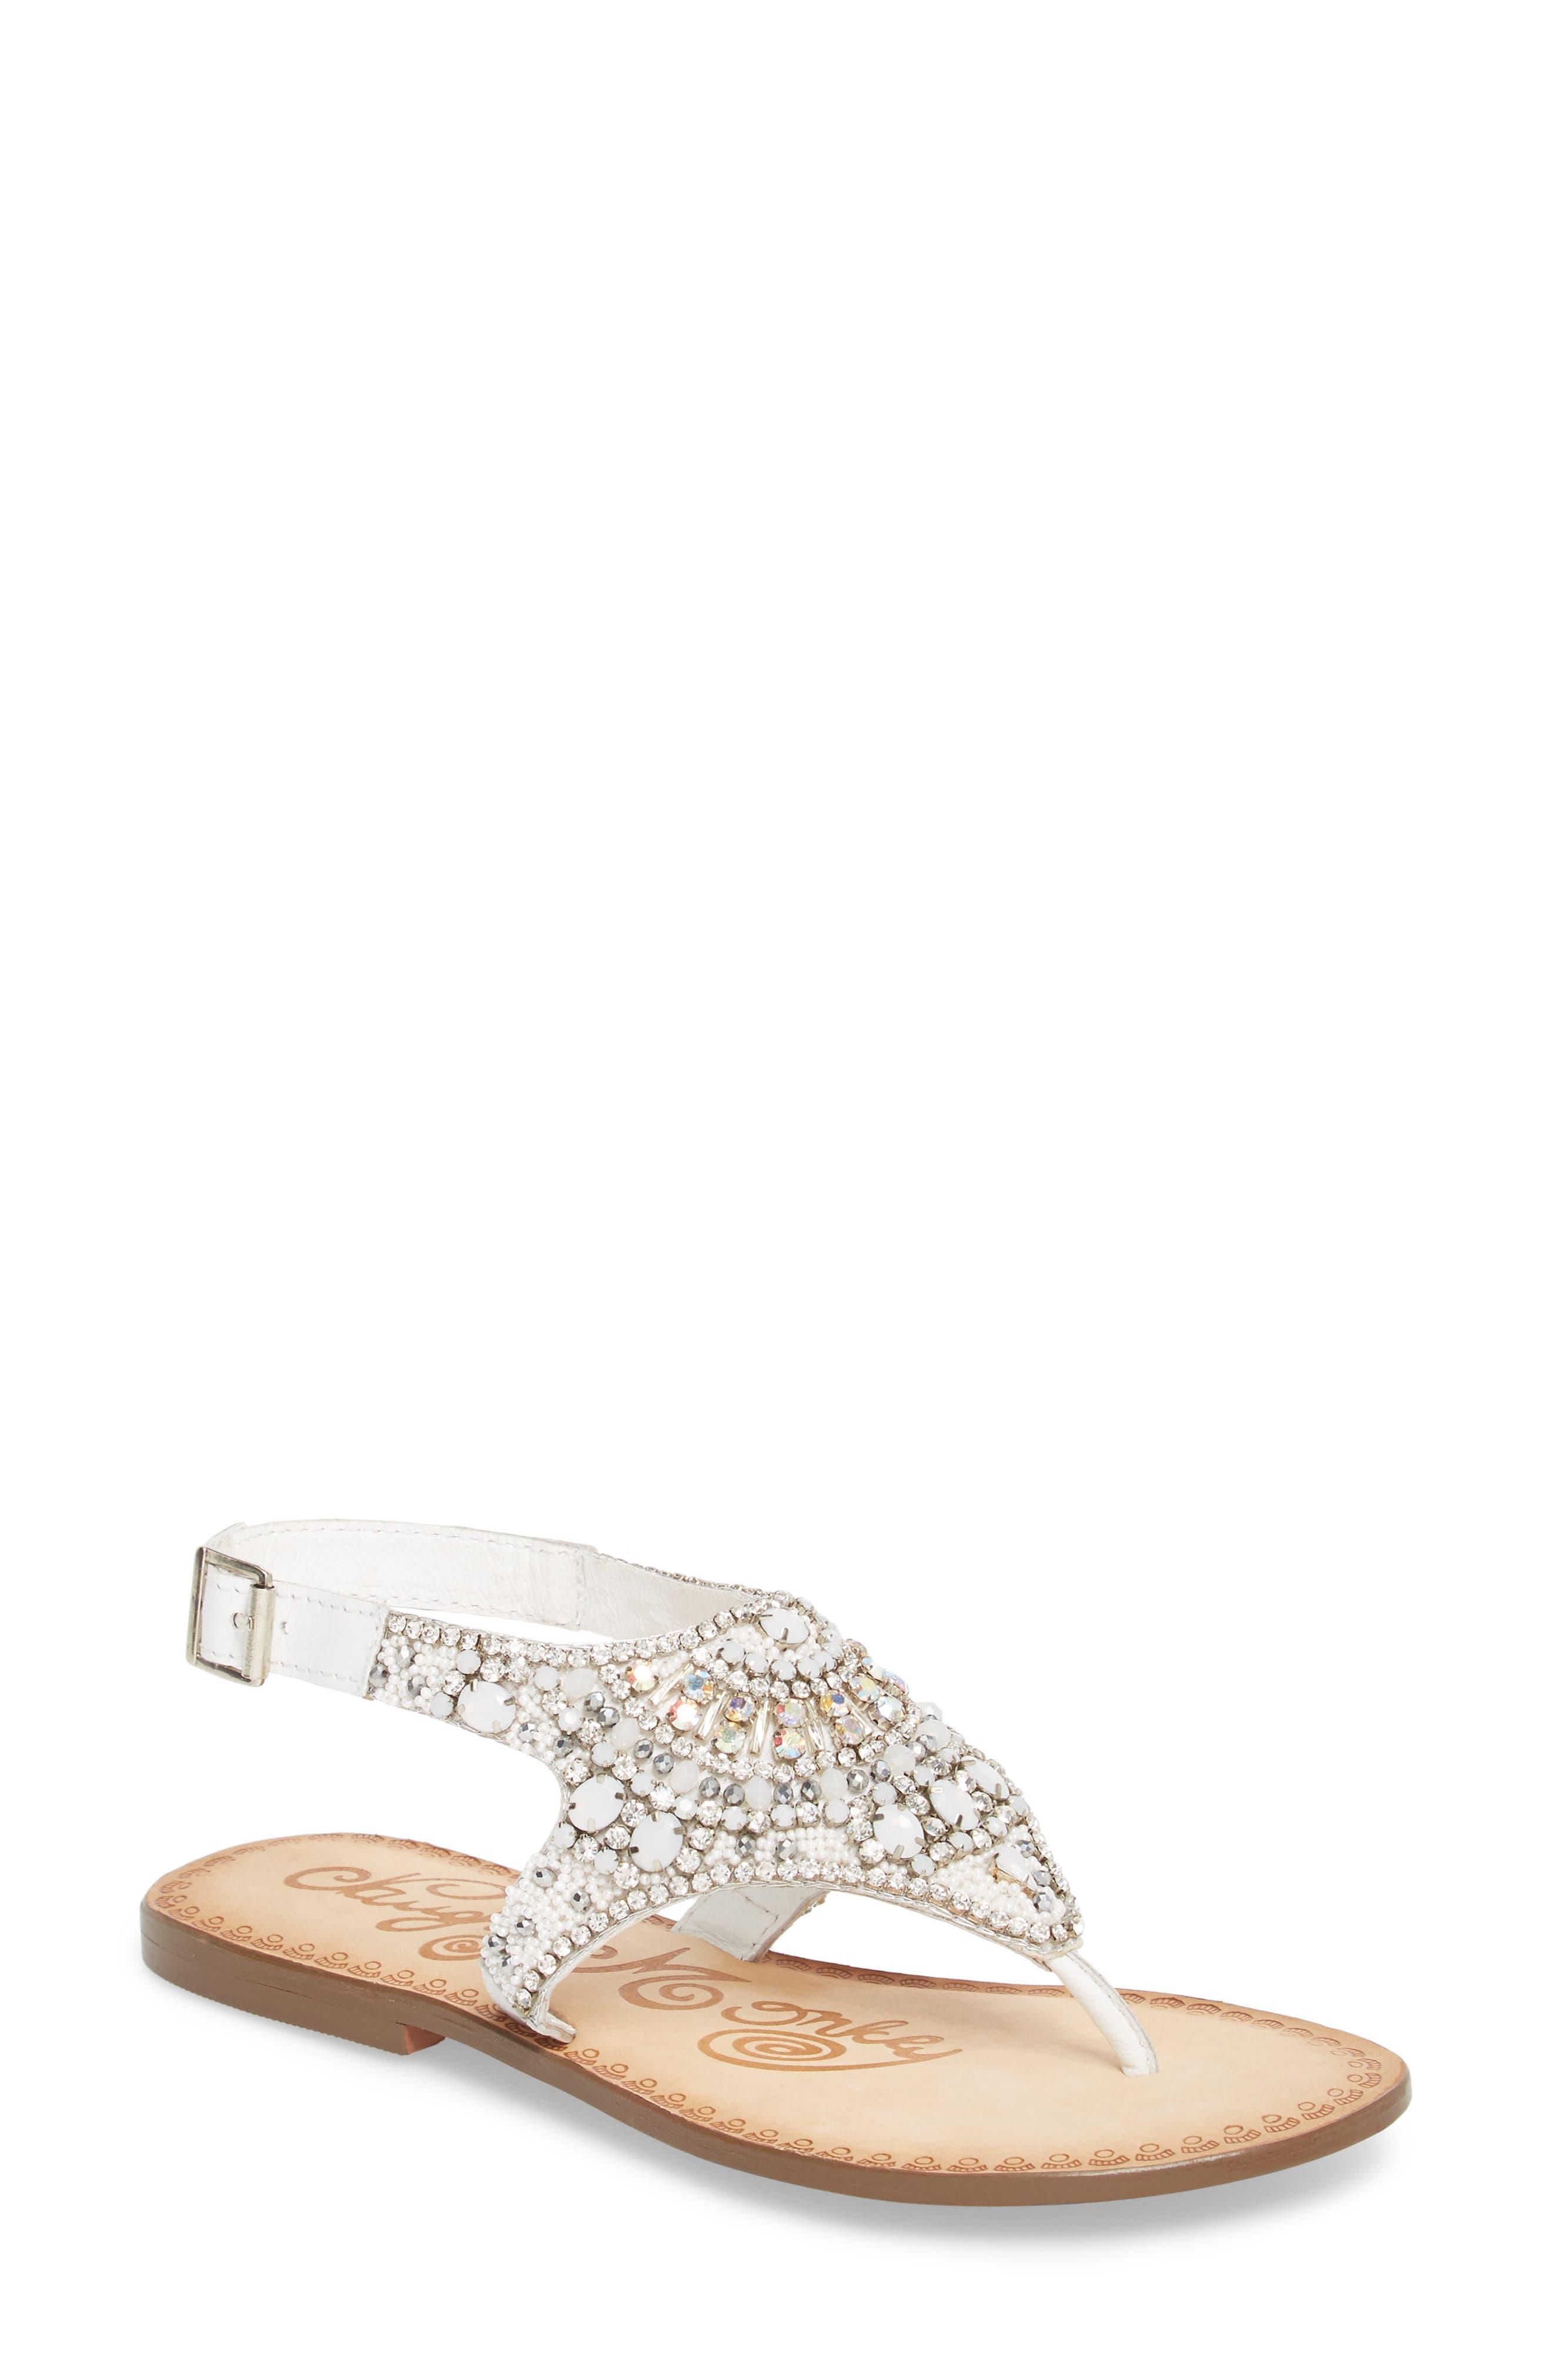 Iceberg Crystal Embellished Sandal,                             Main thumbnail 1, color,                             White Leather